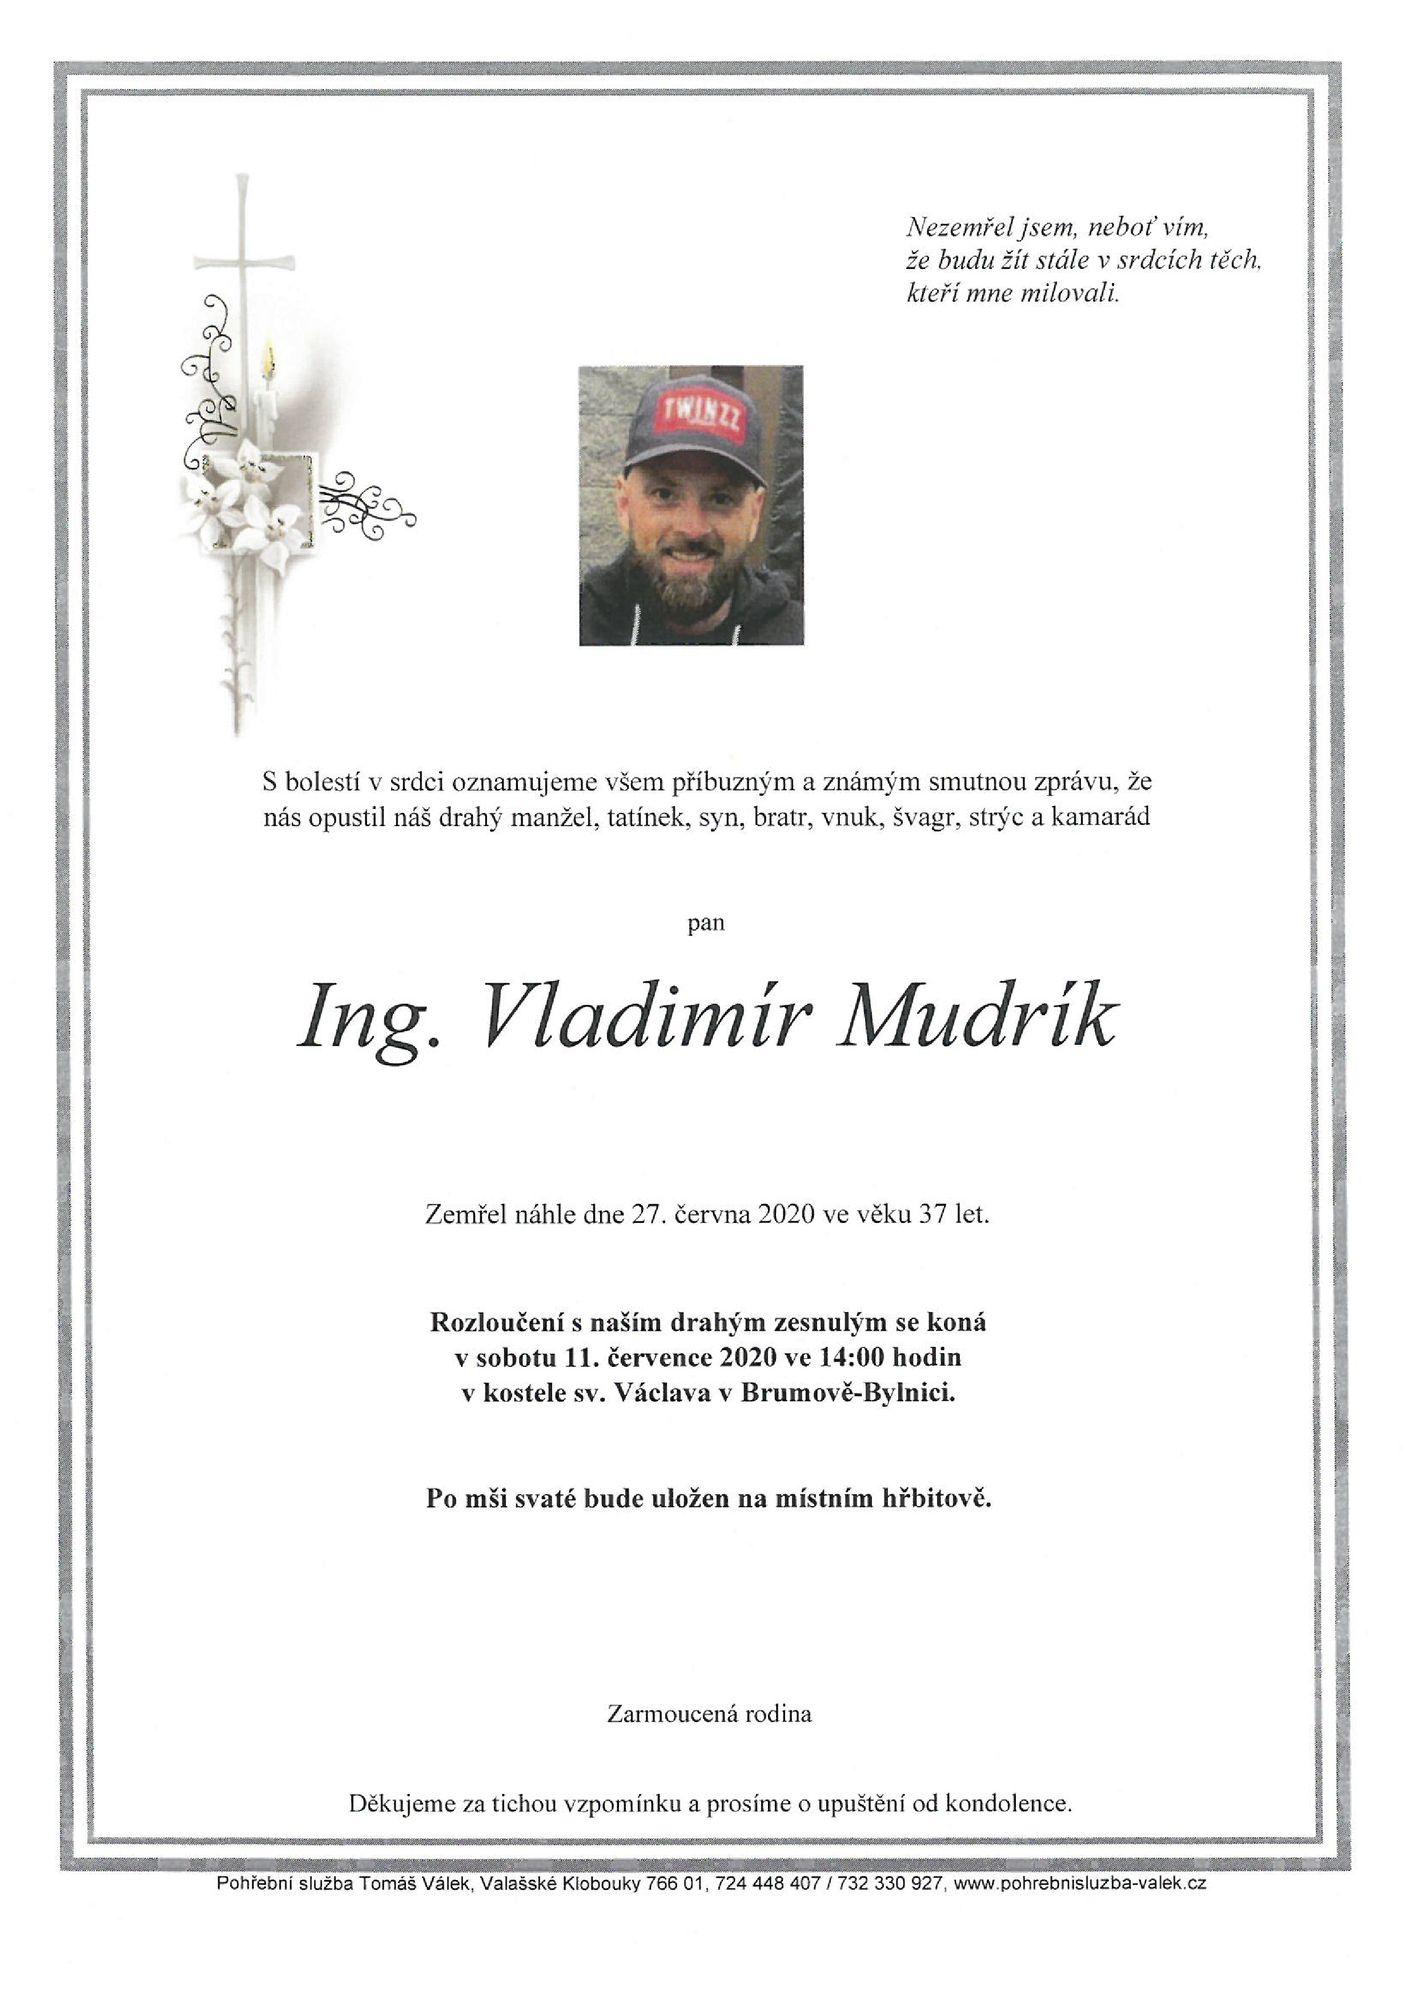 Ing. Vladimír Mudrík